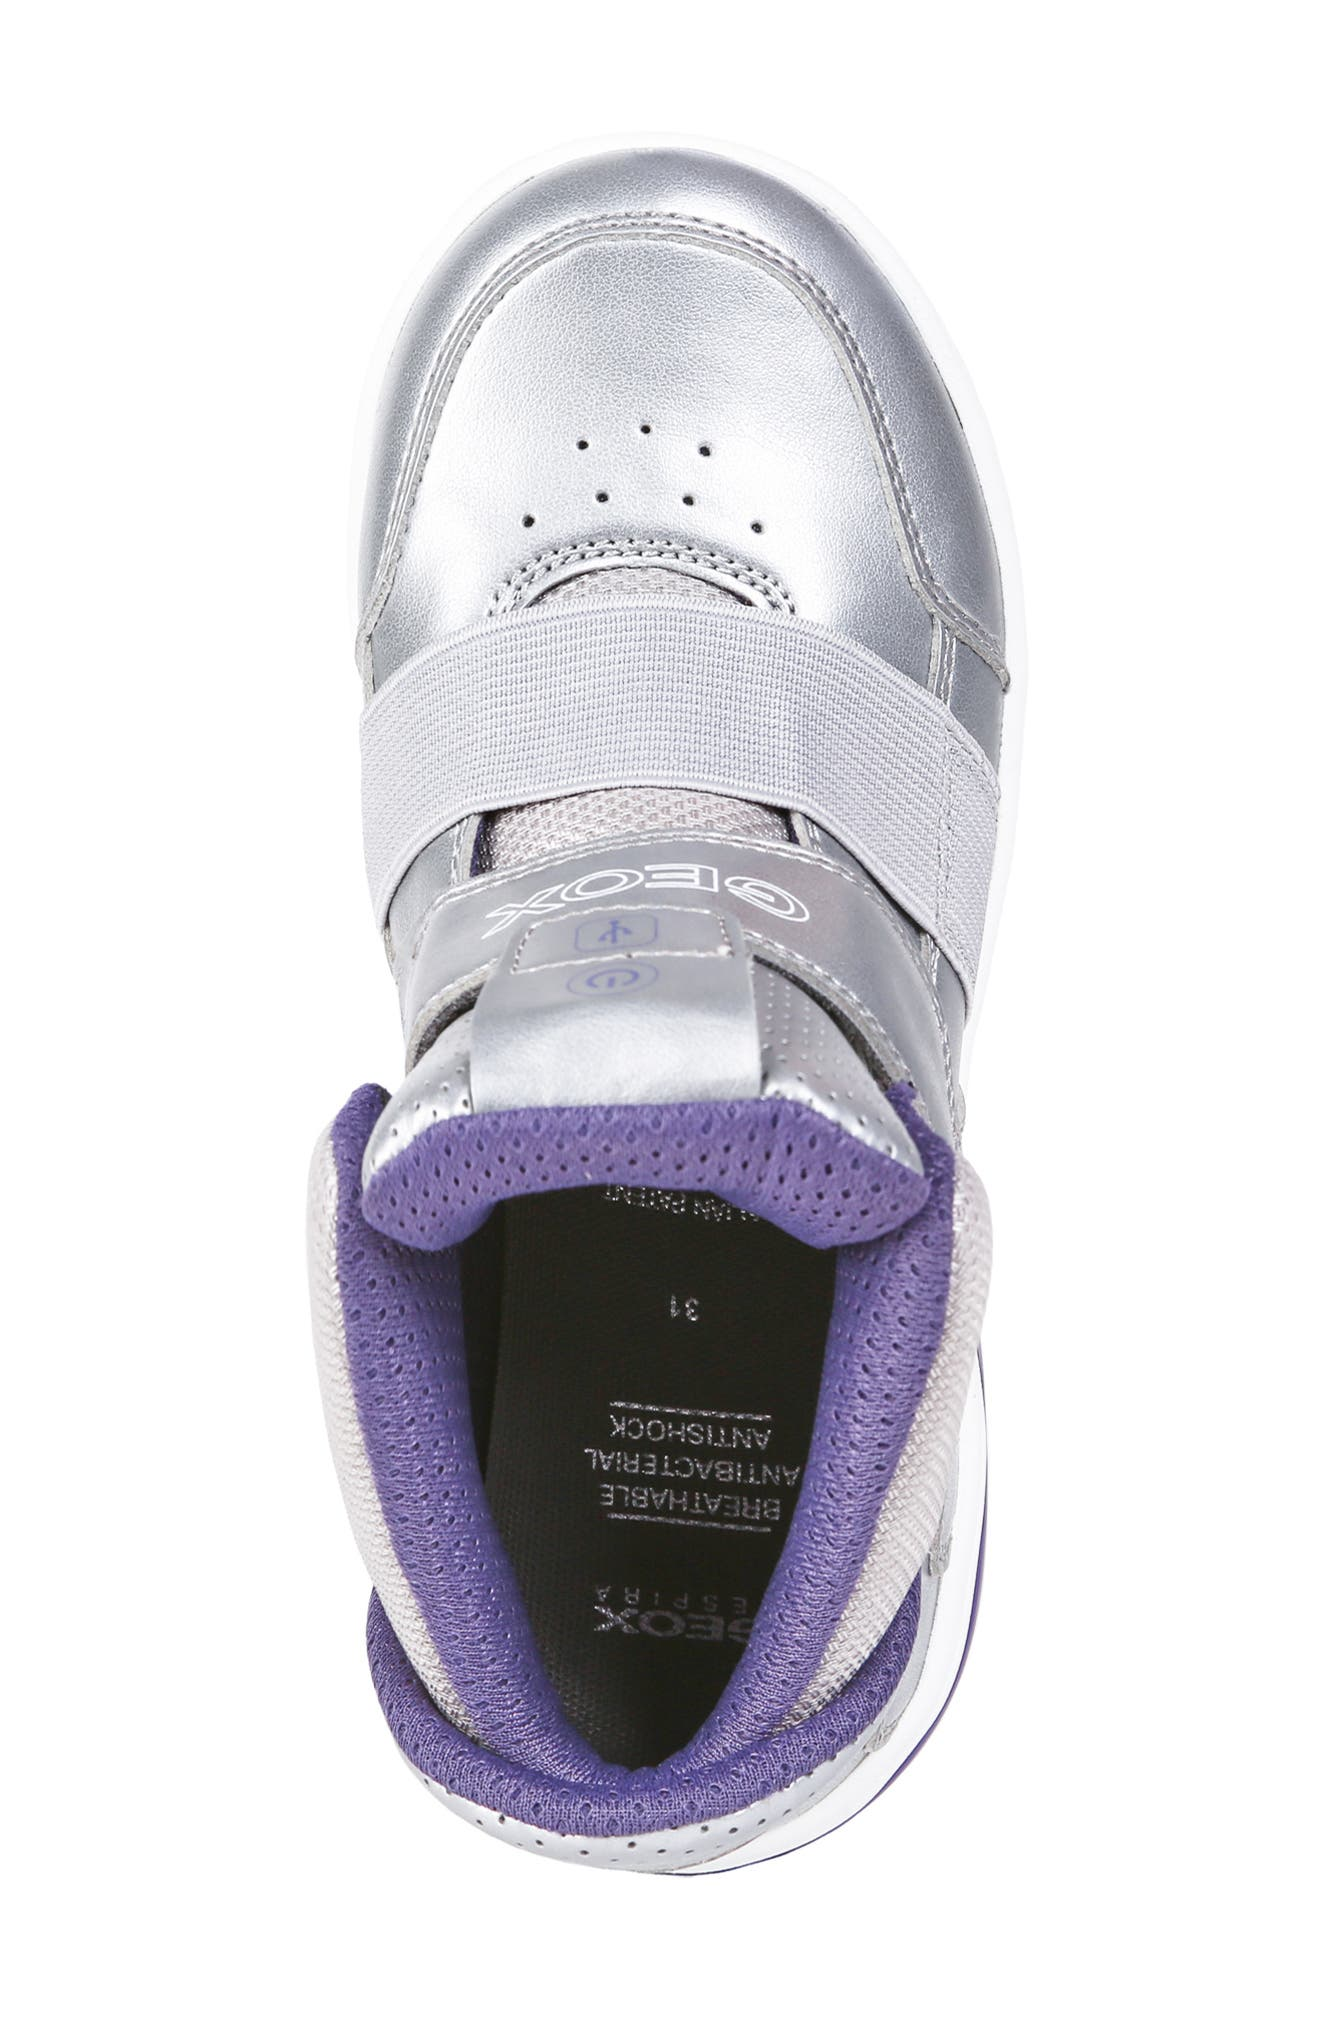 Xled Light Up Sneaker,                             Alternate thumbnail 5, color,                             SILVER/ VIOLET